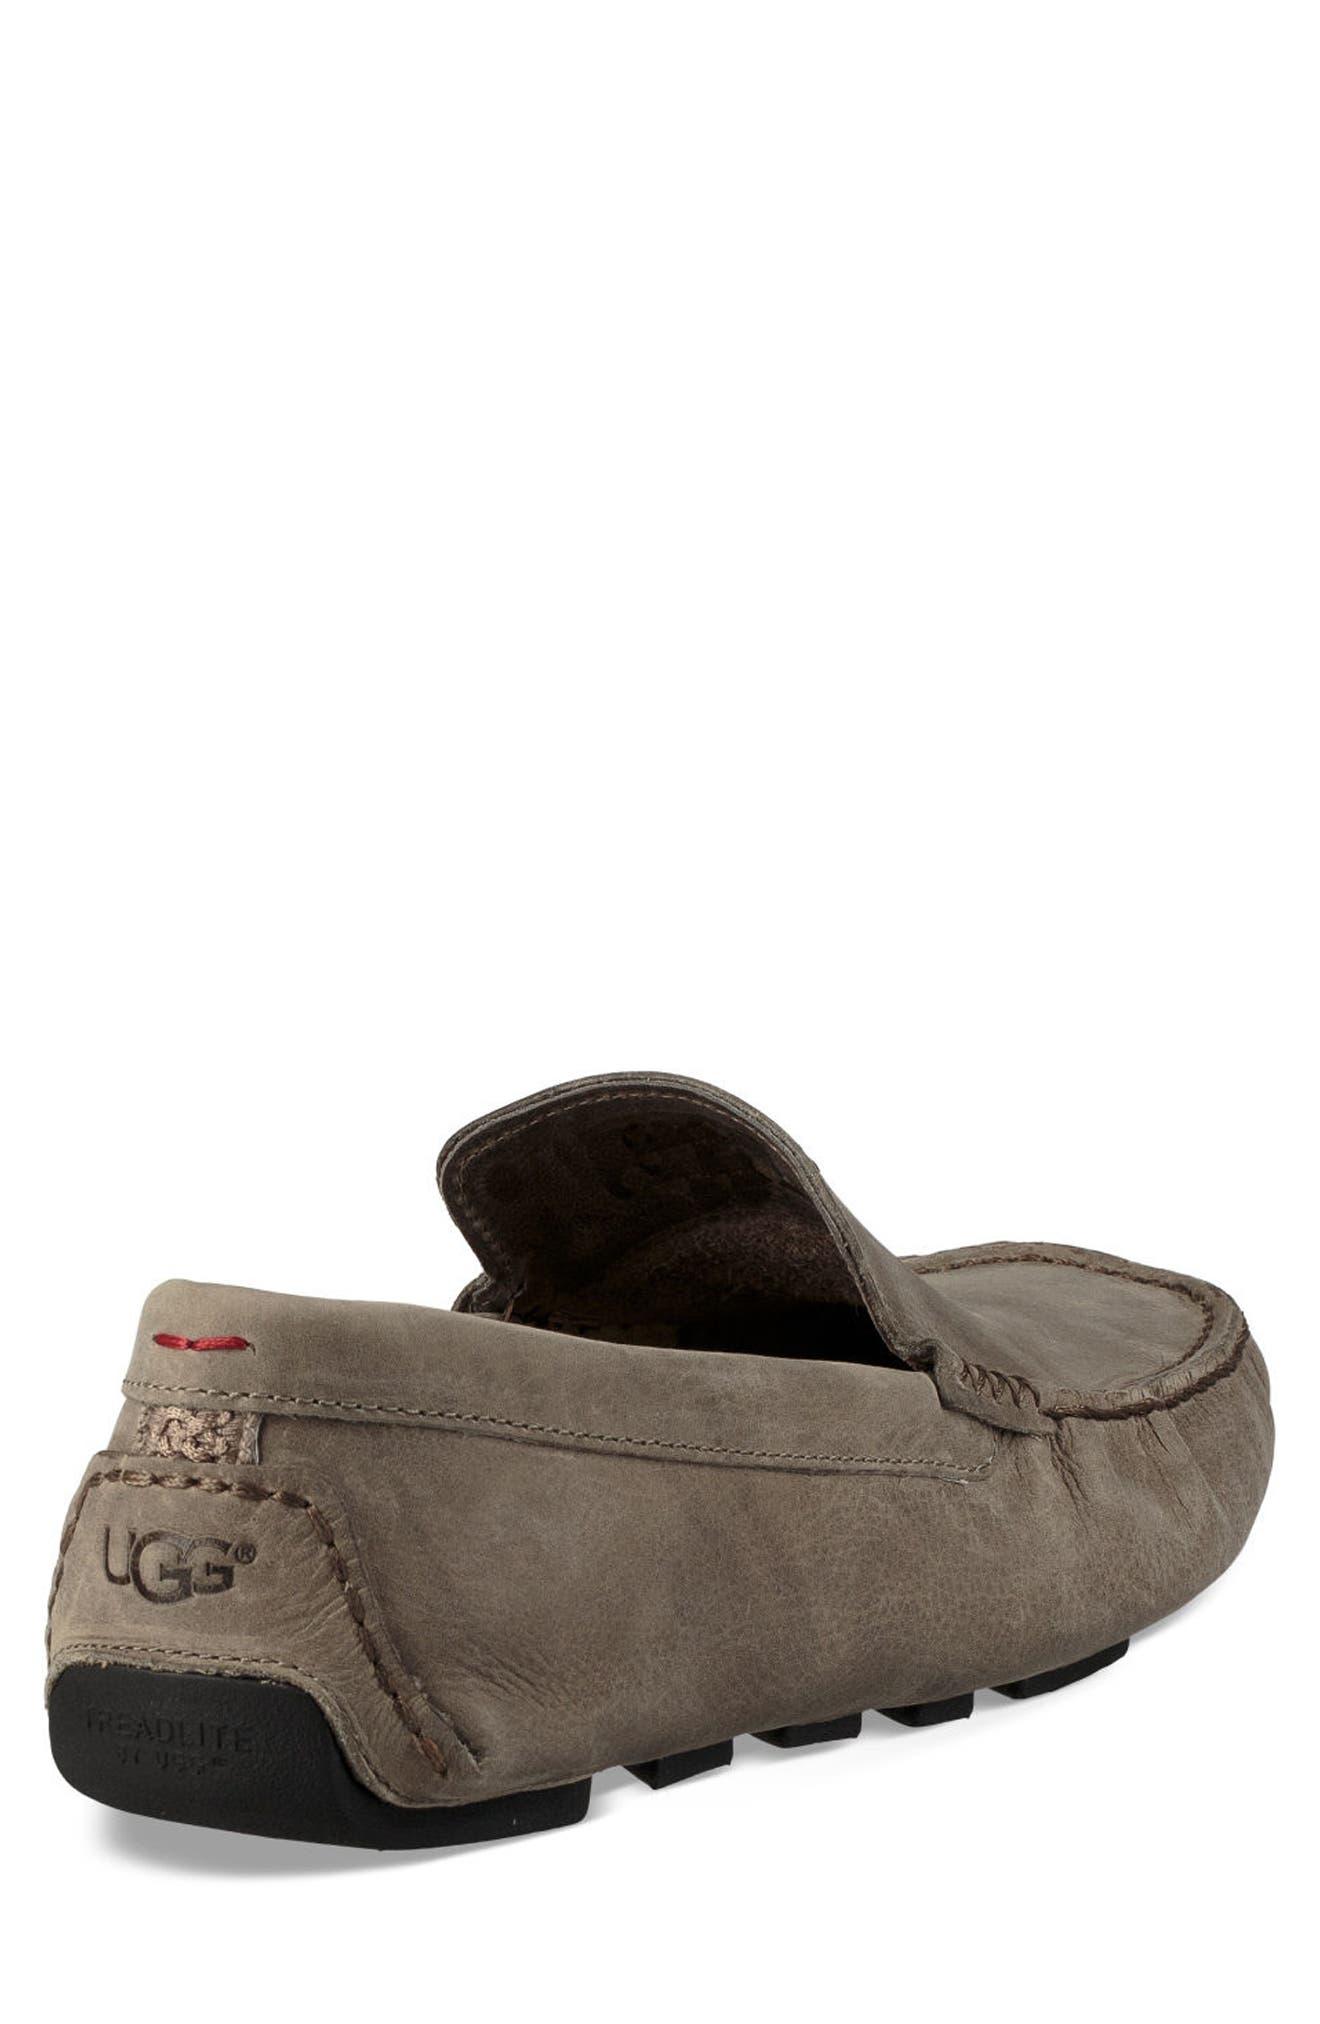 UGG<SUP>®</SUP>, 'Henrick' Driving Shoe, Alternate thumbnail 2, color, PUMICE